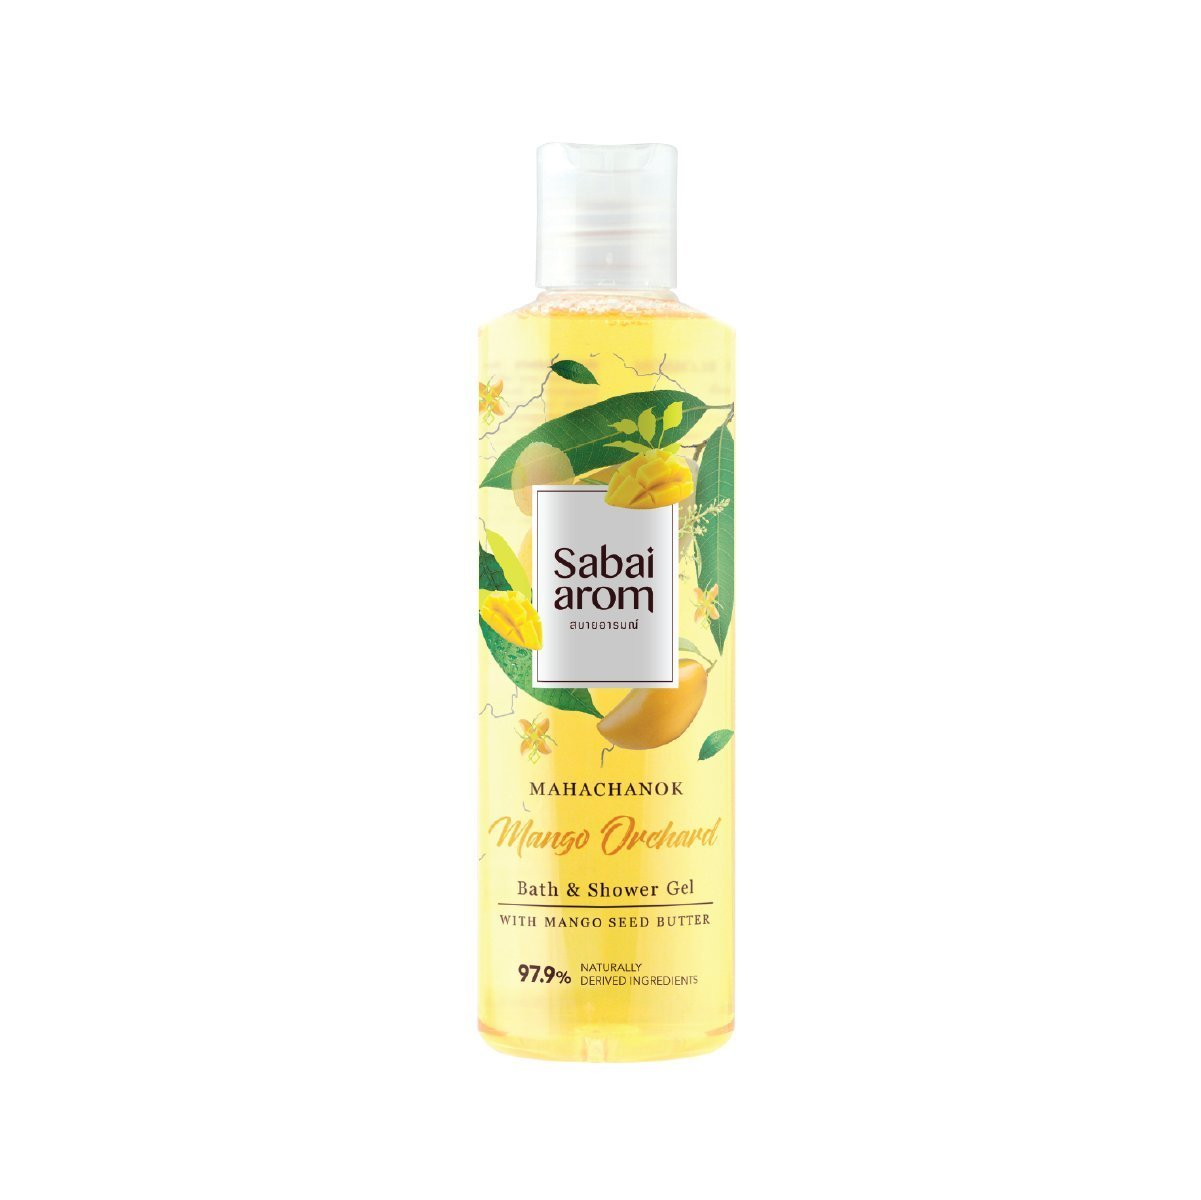 Sabai-arom Mango Orchard Bath & Shower Gel 250 ml. (4 Pack)